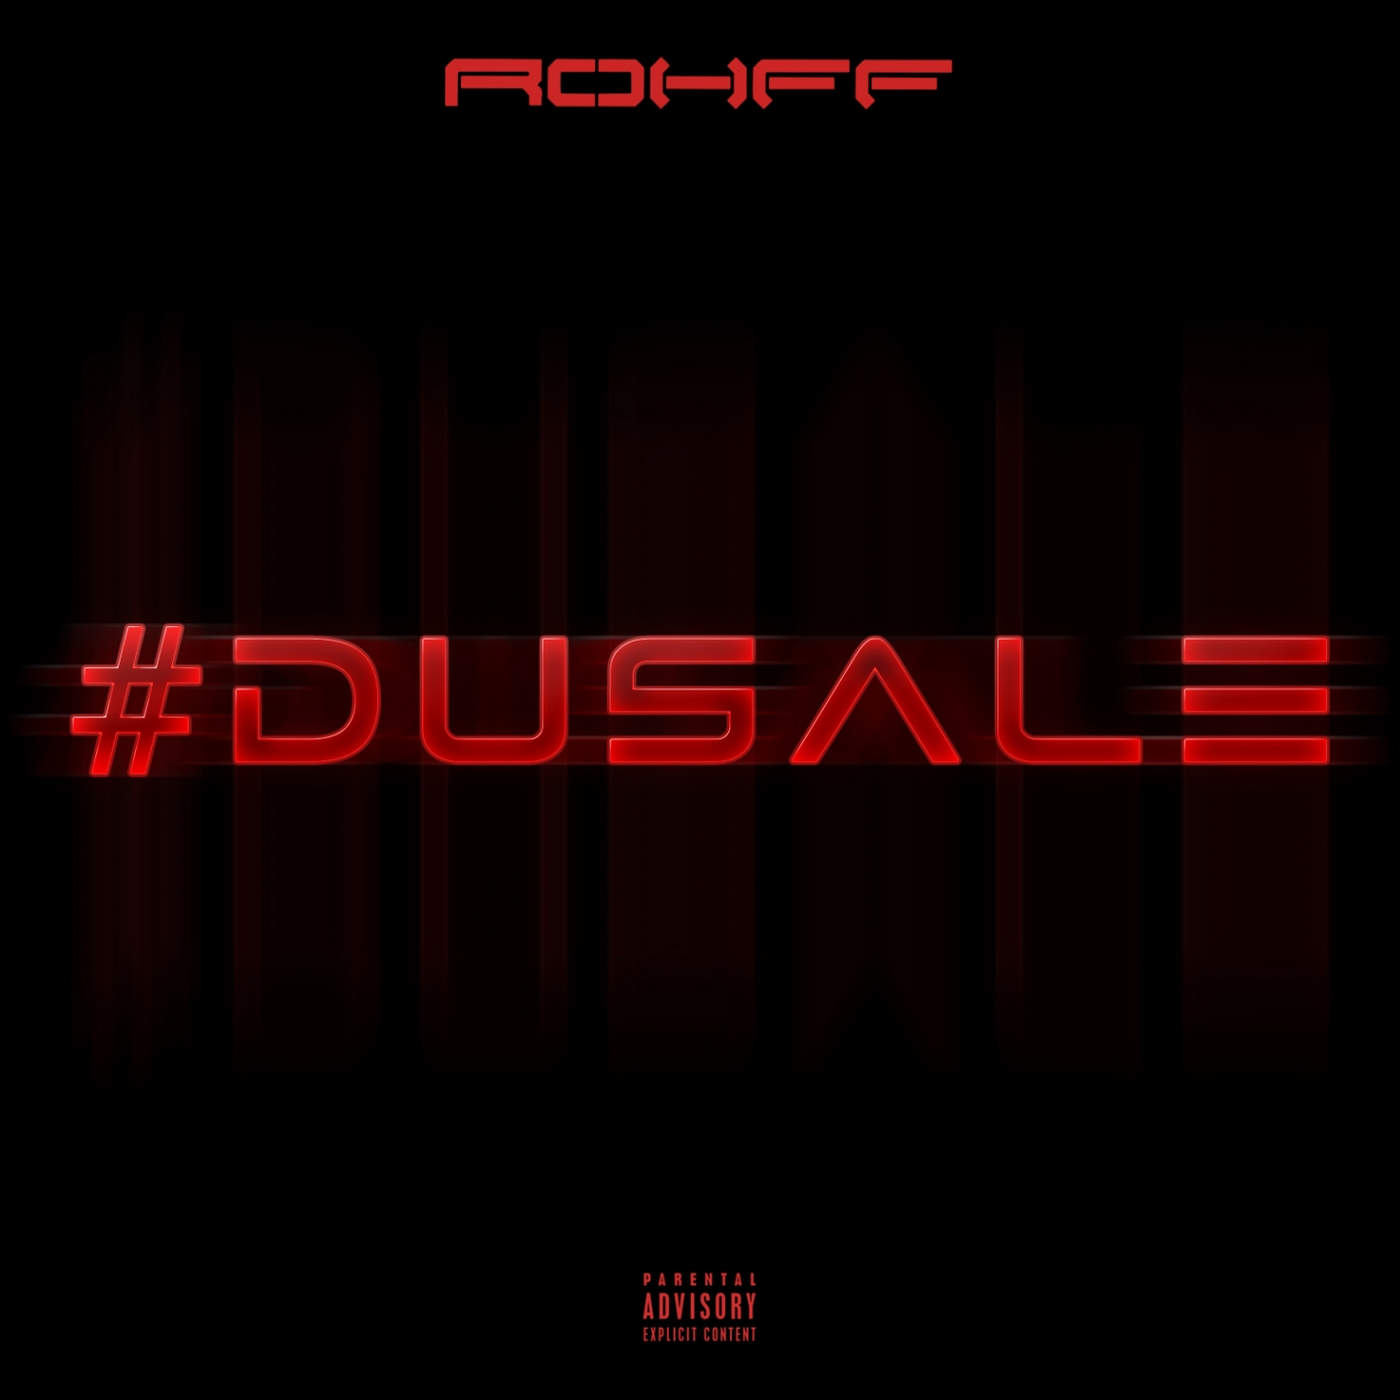 Rohff - Du sale - Single Cover